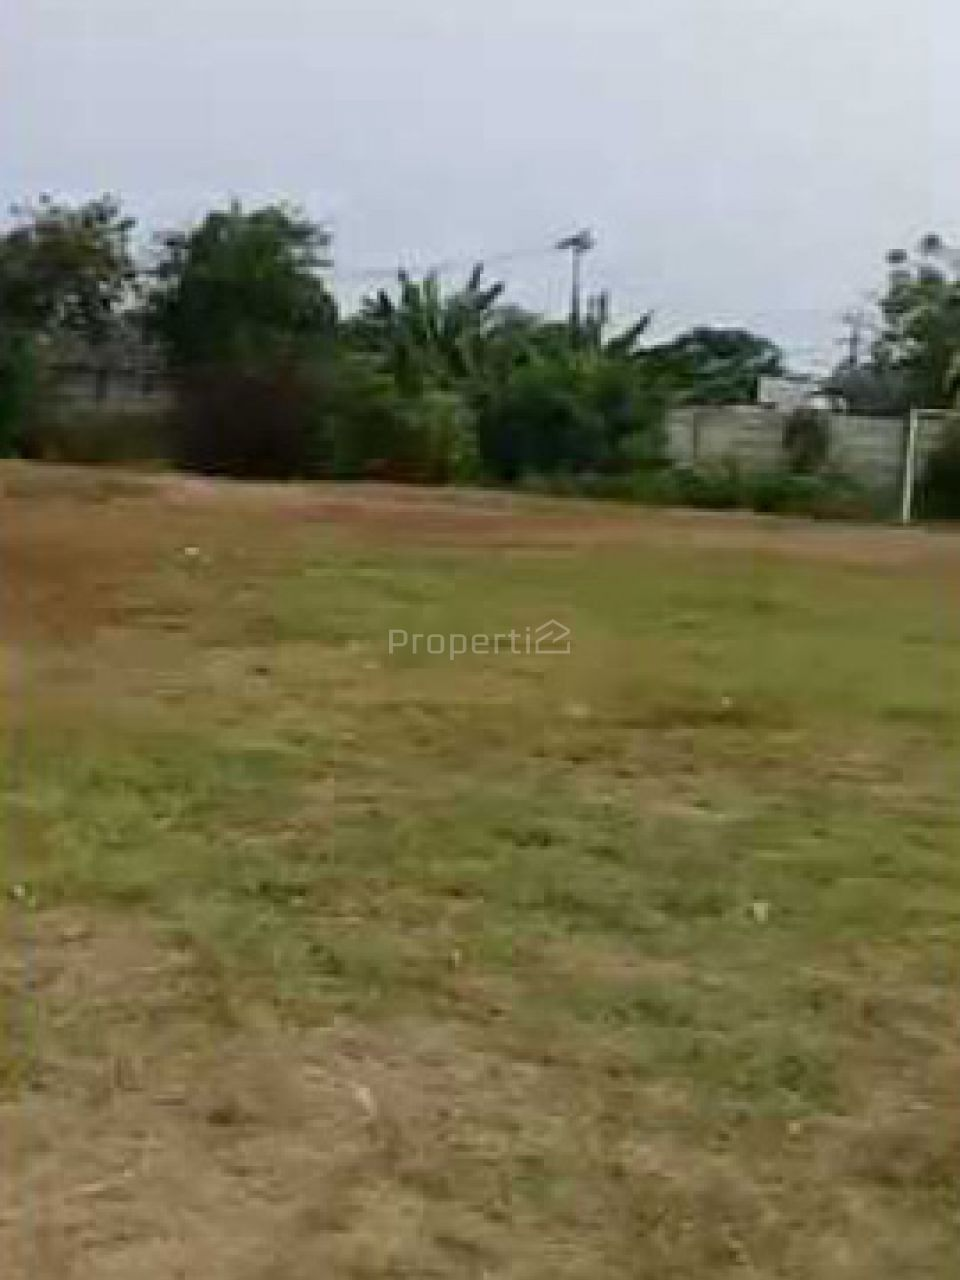 Tanah Lapang Komersial di Tangerang, Banten